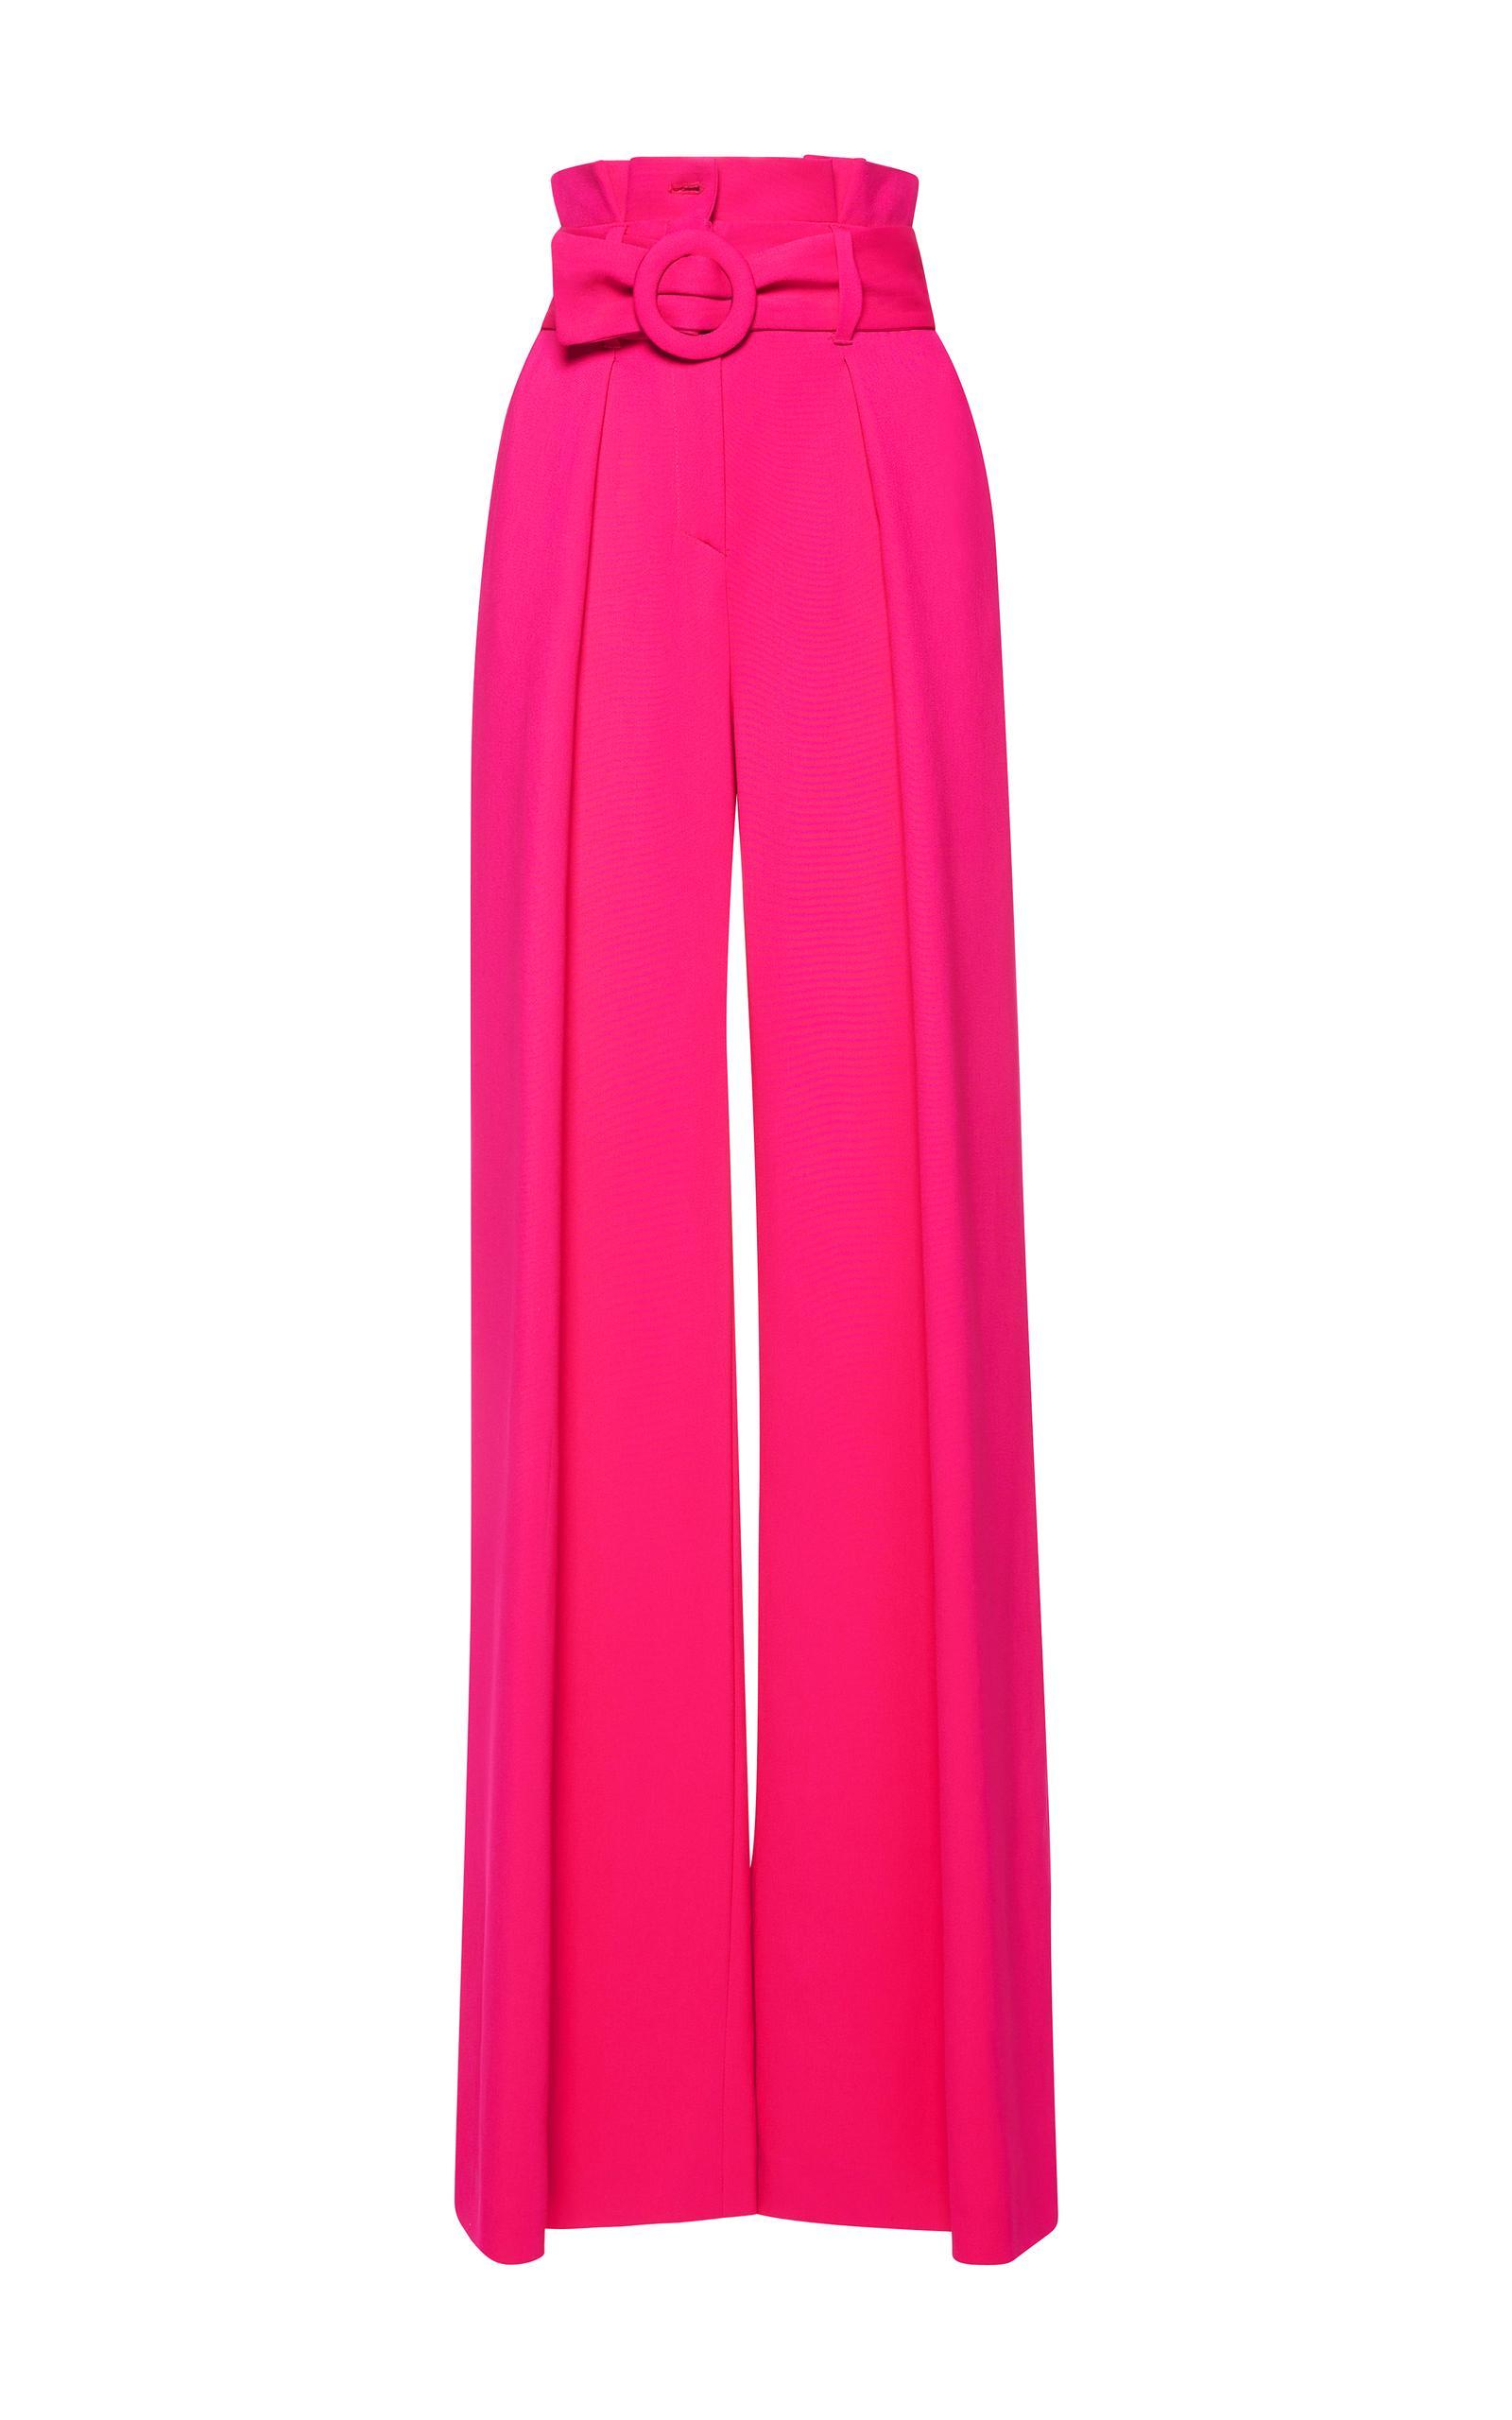 Zuhair murad Pleated High Waist Cady Pants in Pink